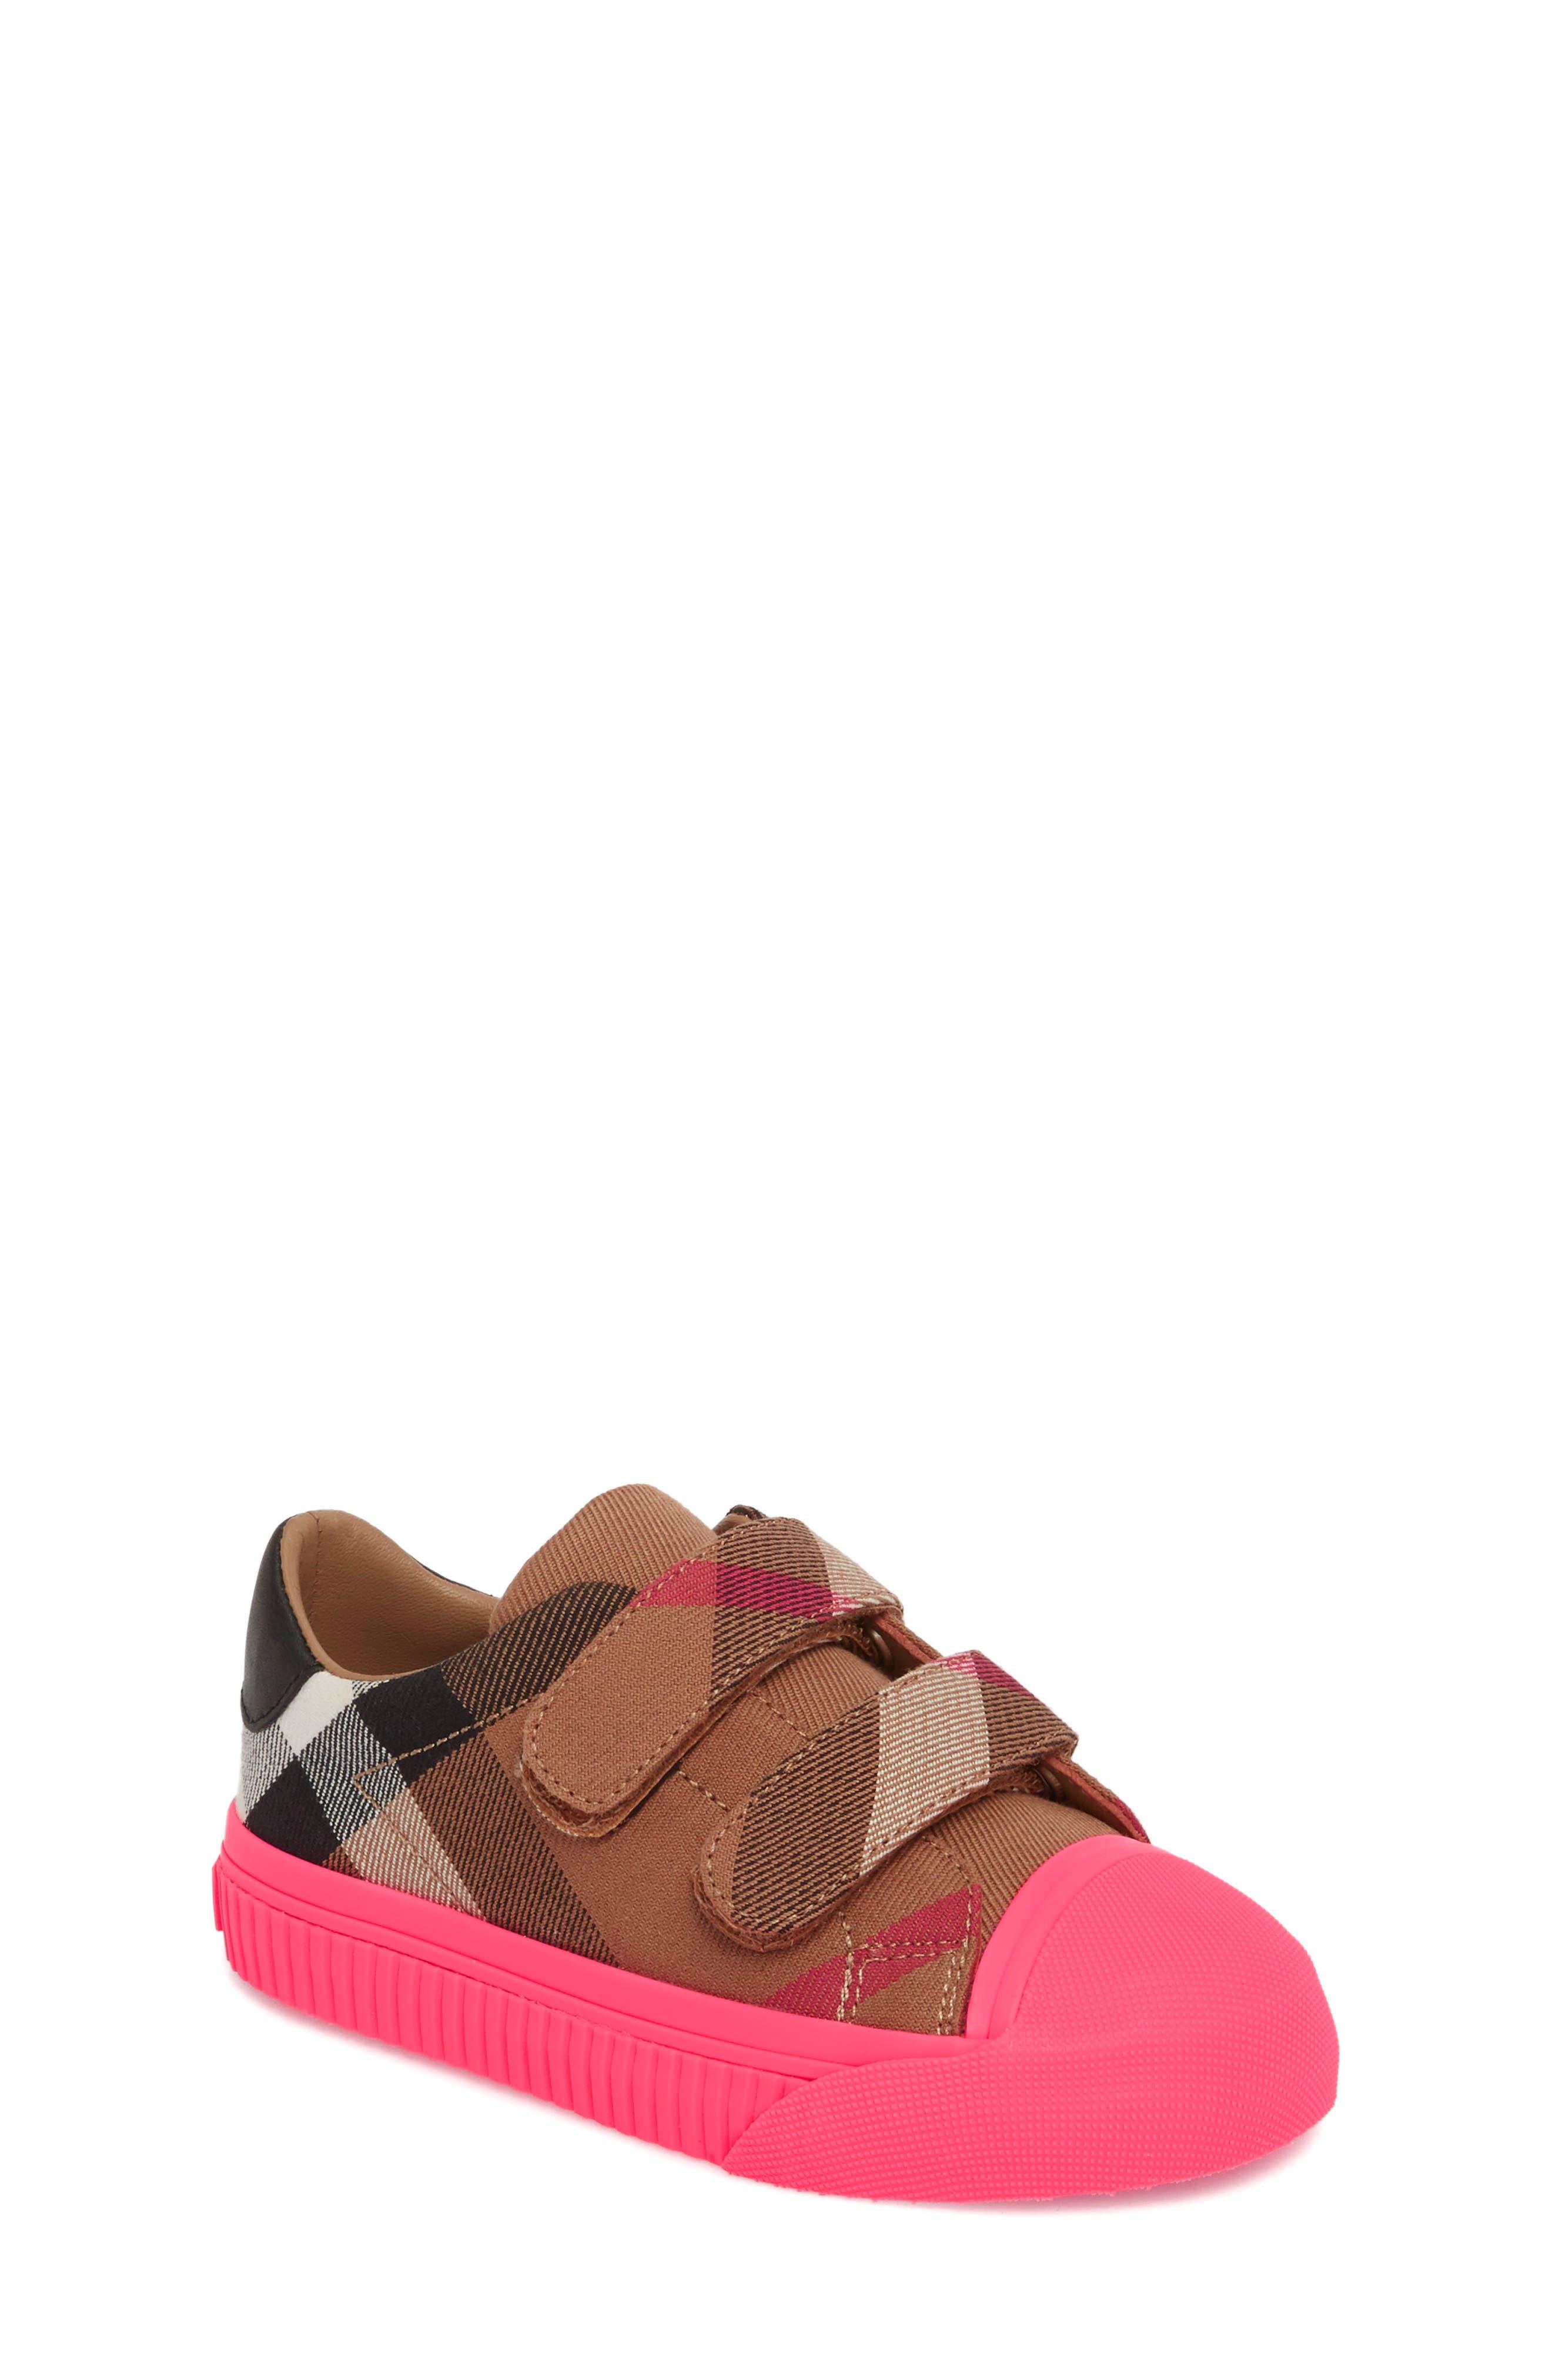 Belside Sneaker,                             Main thumbnail 1, color,                             Classic/ Neon Pink